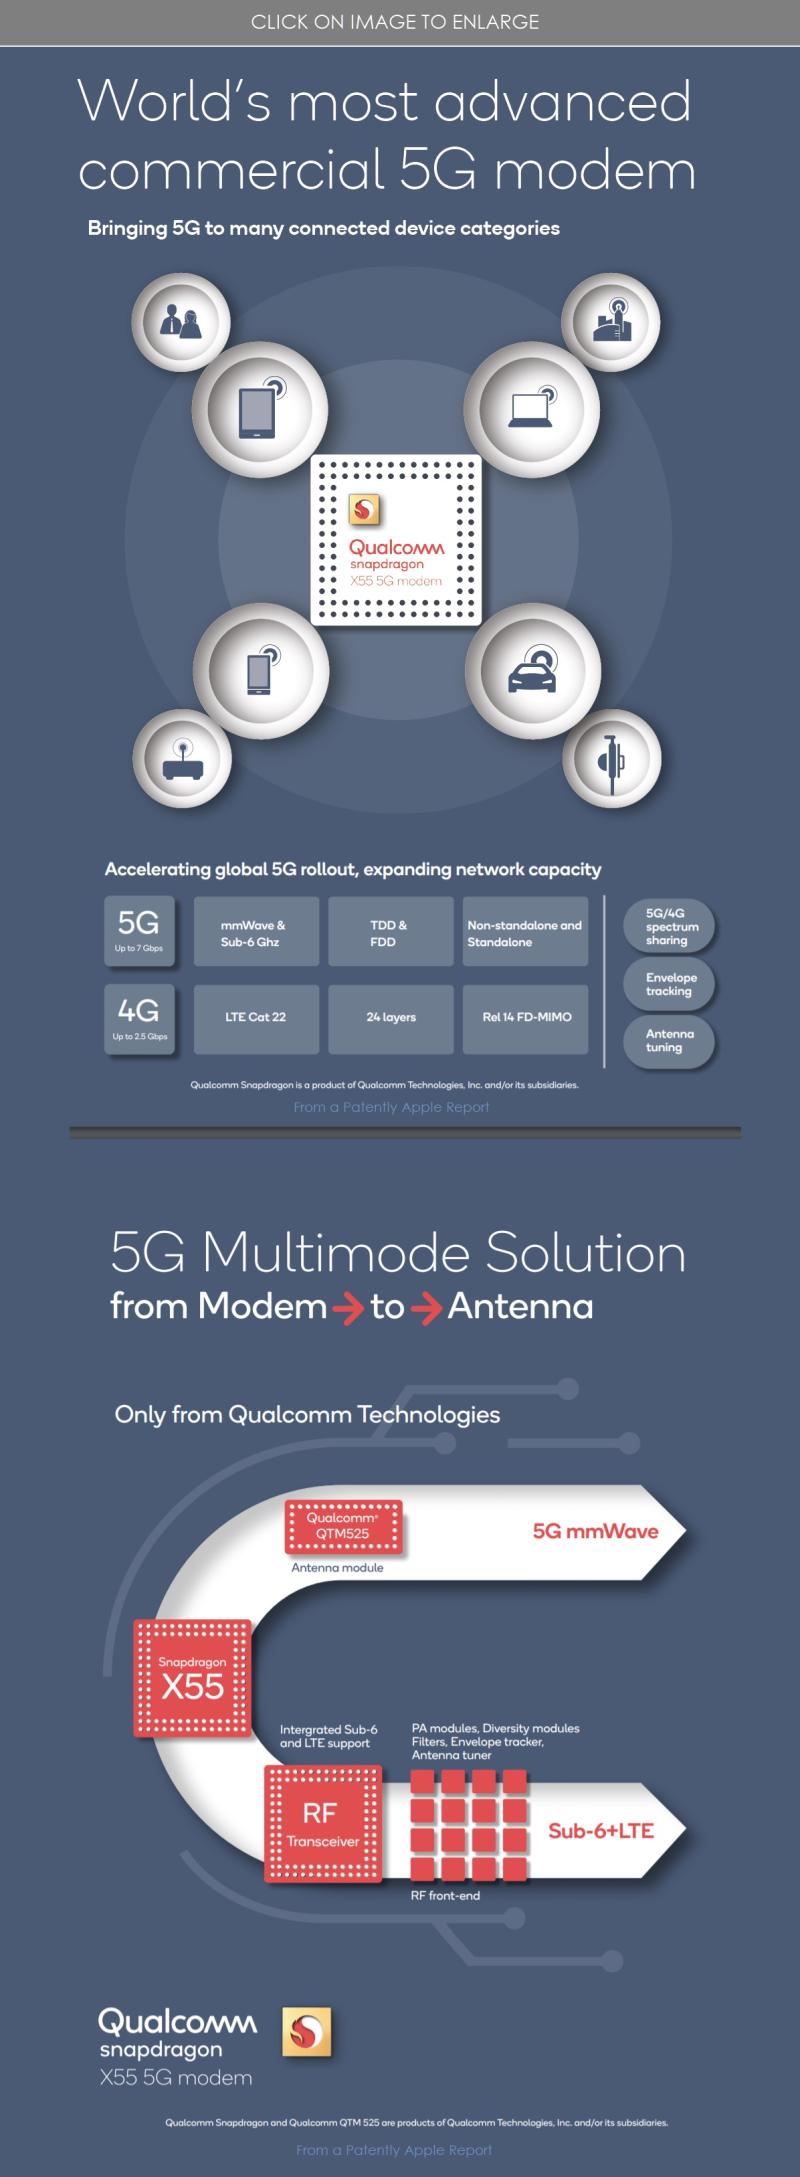 2 QUALCOMM NEXT GEN 5G MODEM